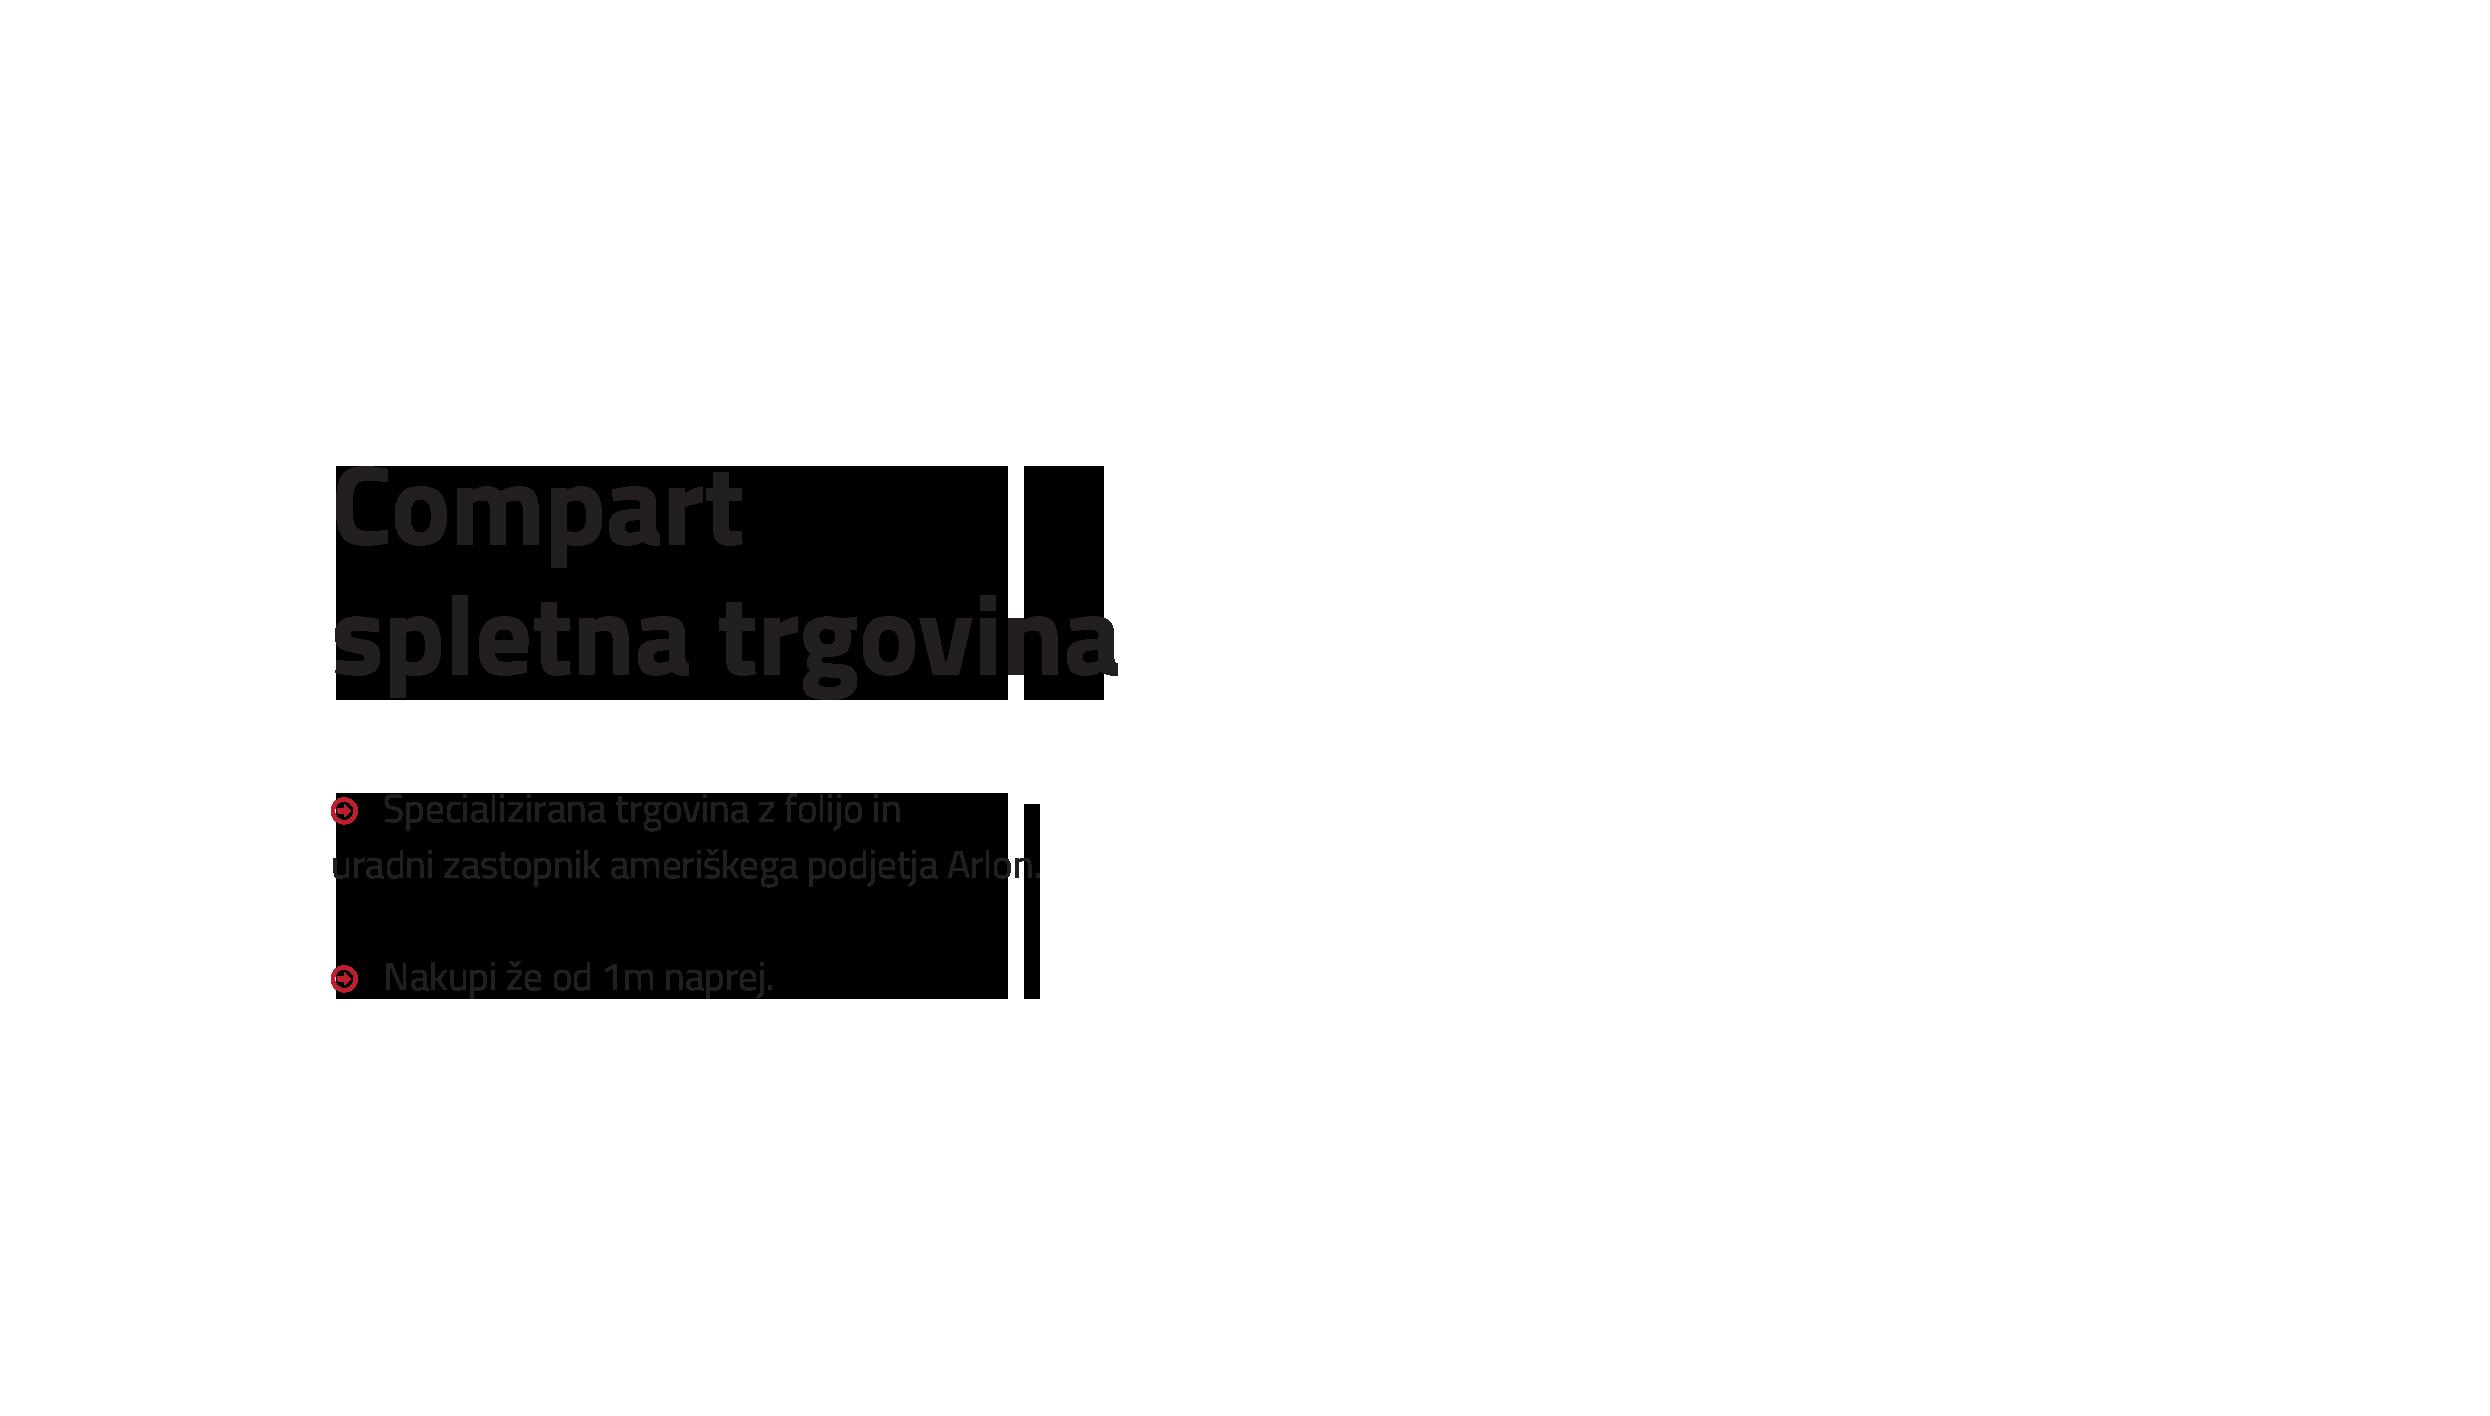 slider_trgovina_text.png